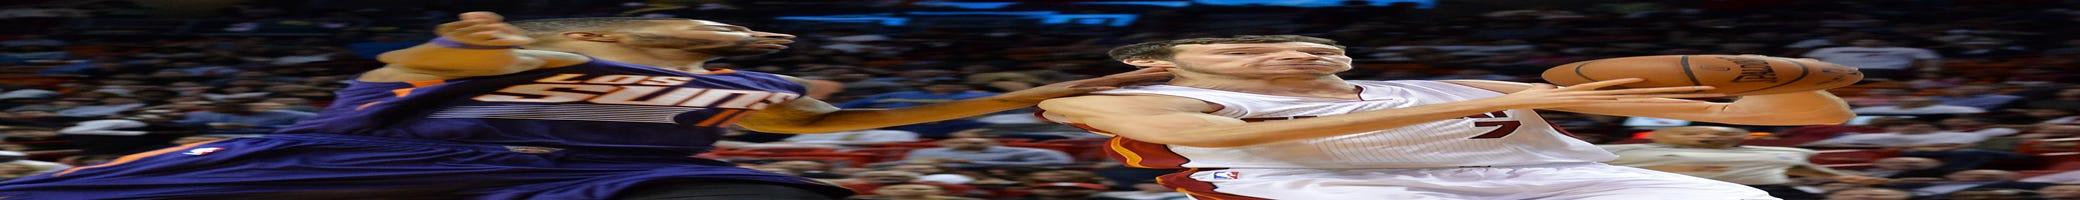 Heat's Dragic returns to face Suns